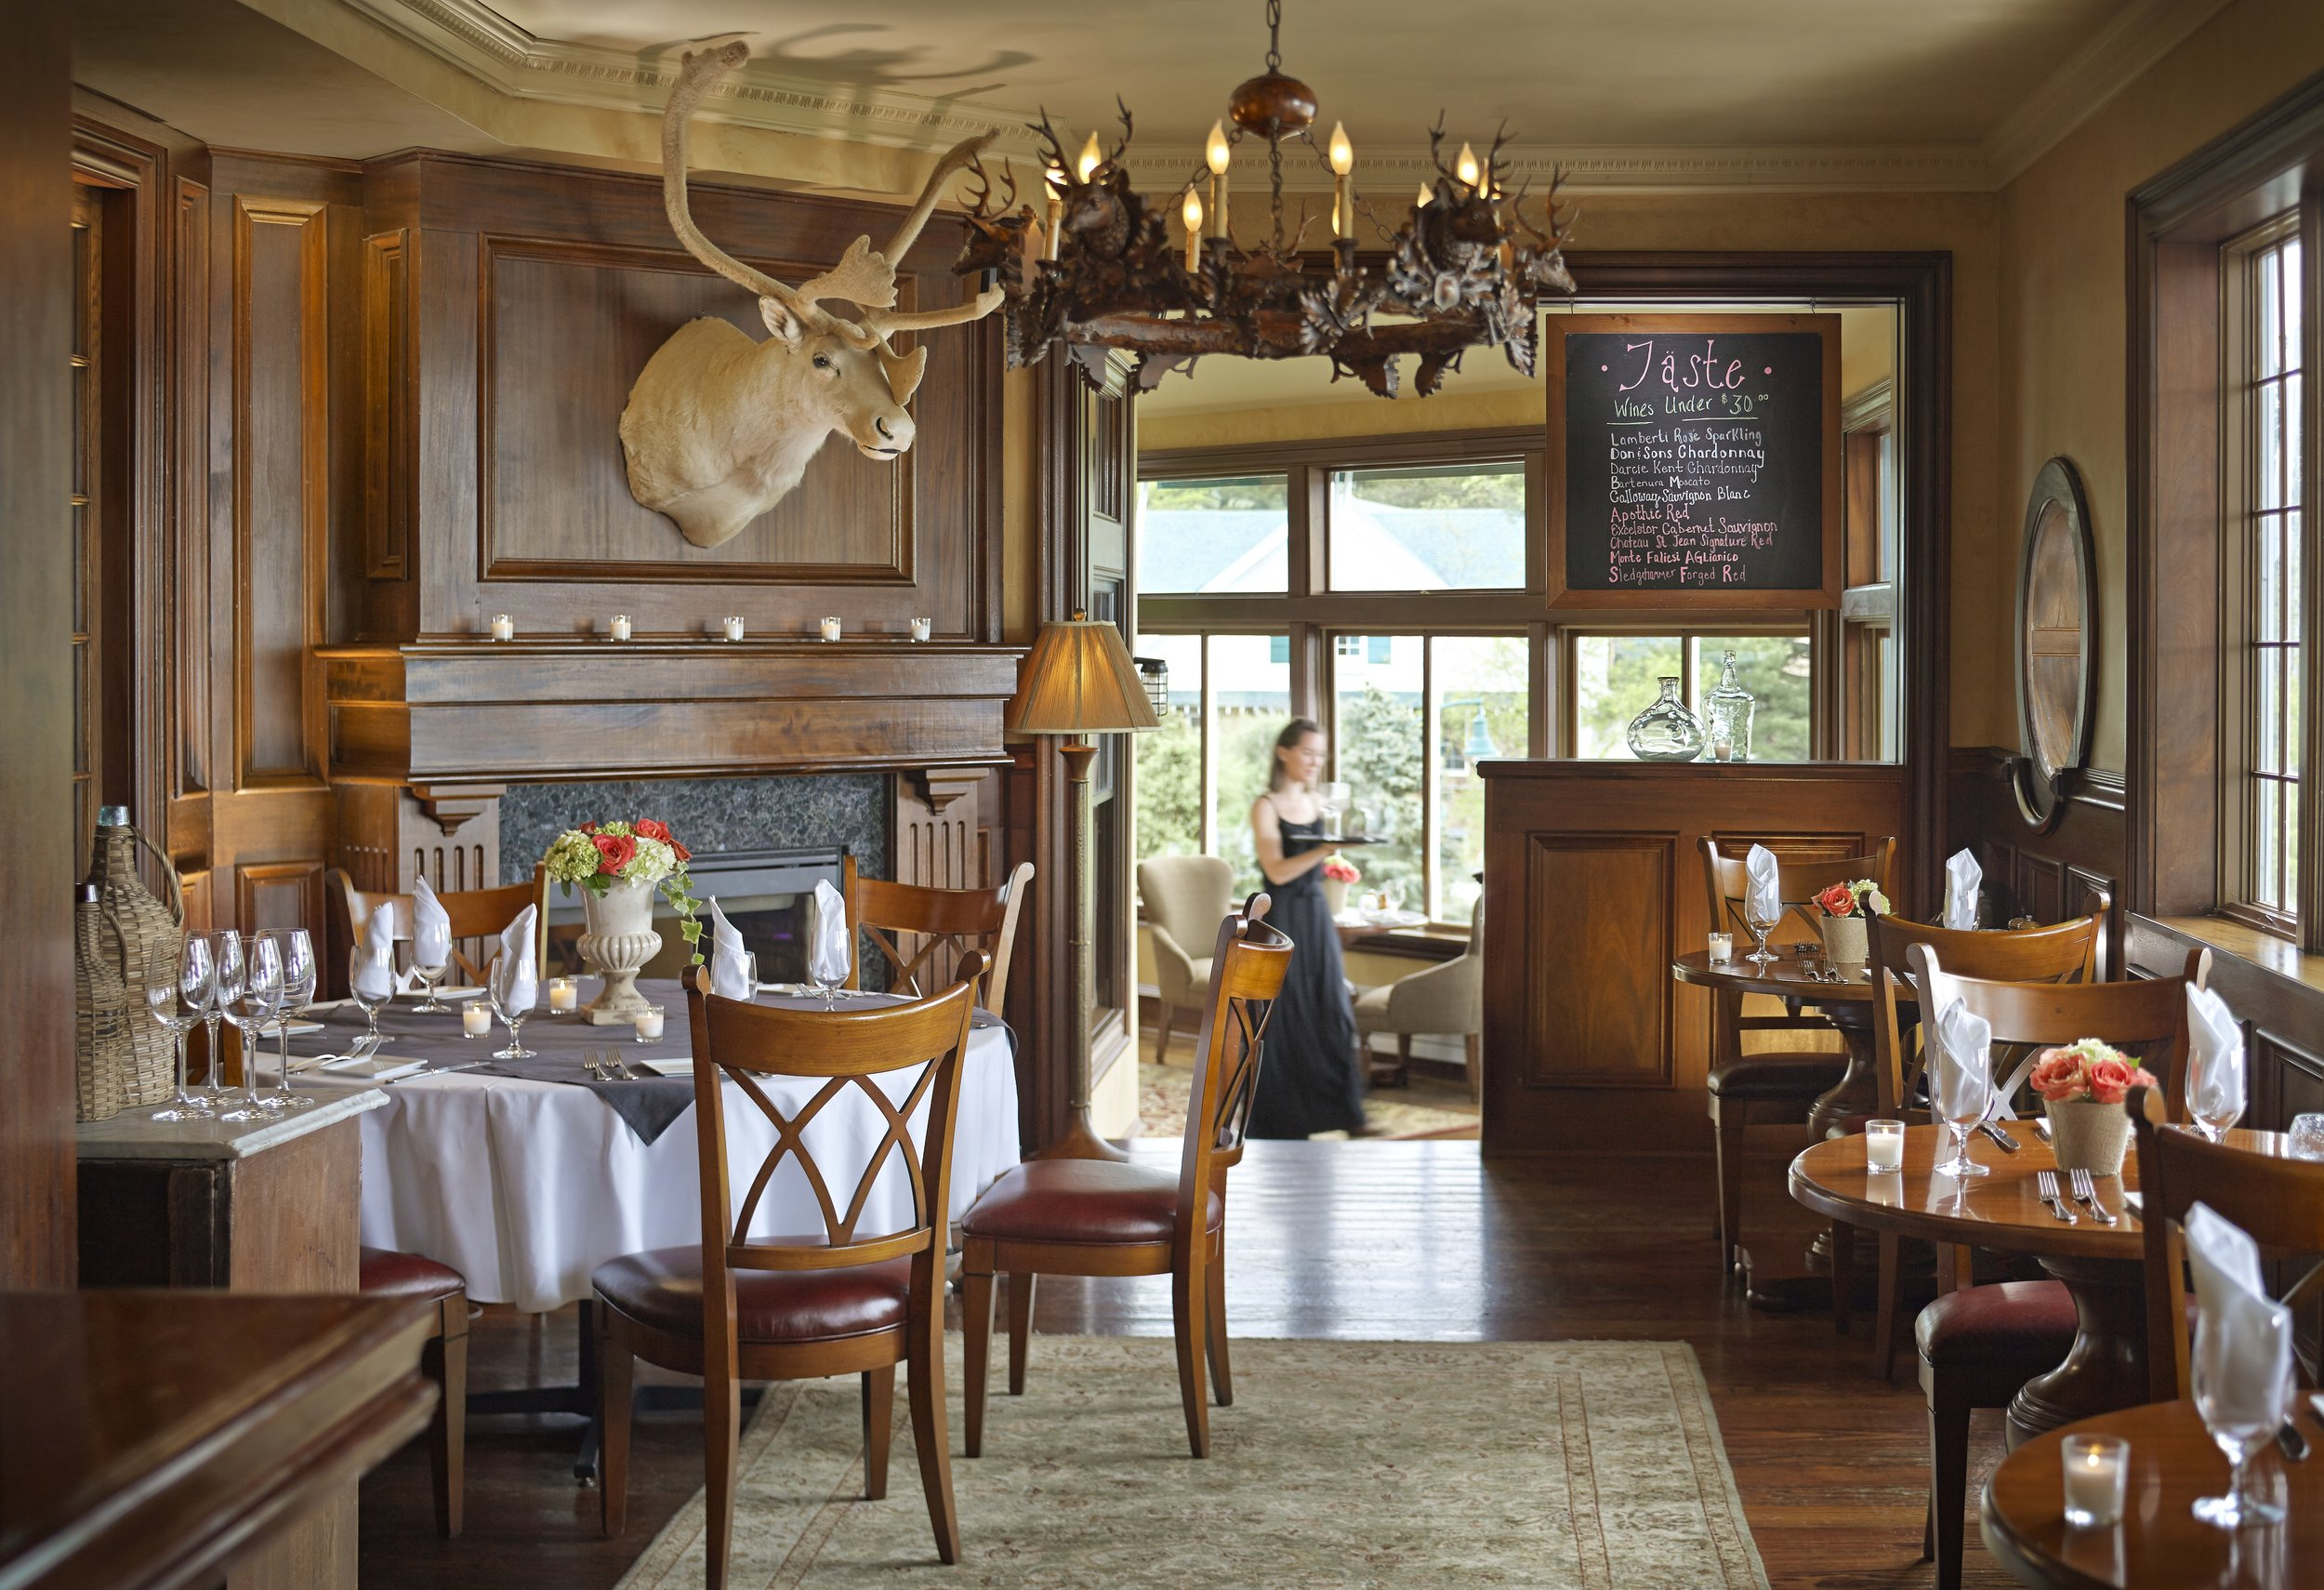 Mirror lake Inn_Culinary Weekend_Carriage House Cooking School_Cooking Classes.jpg